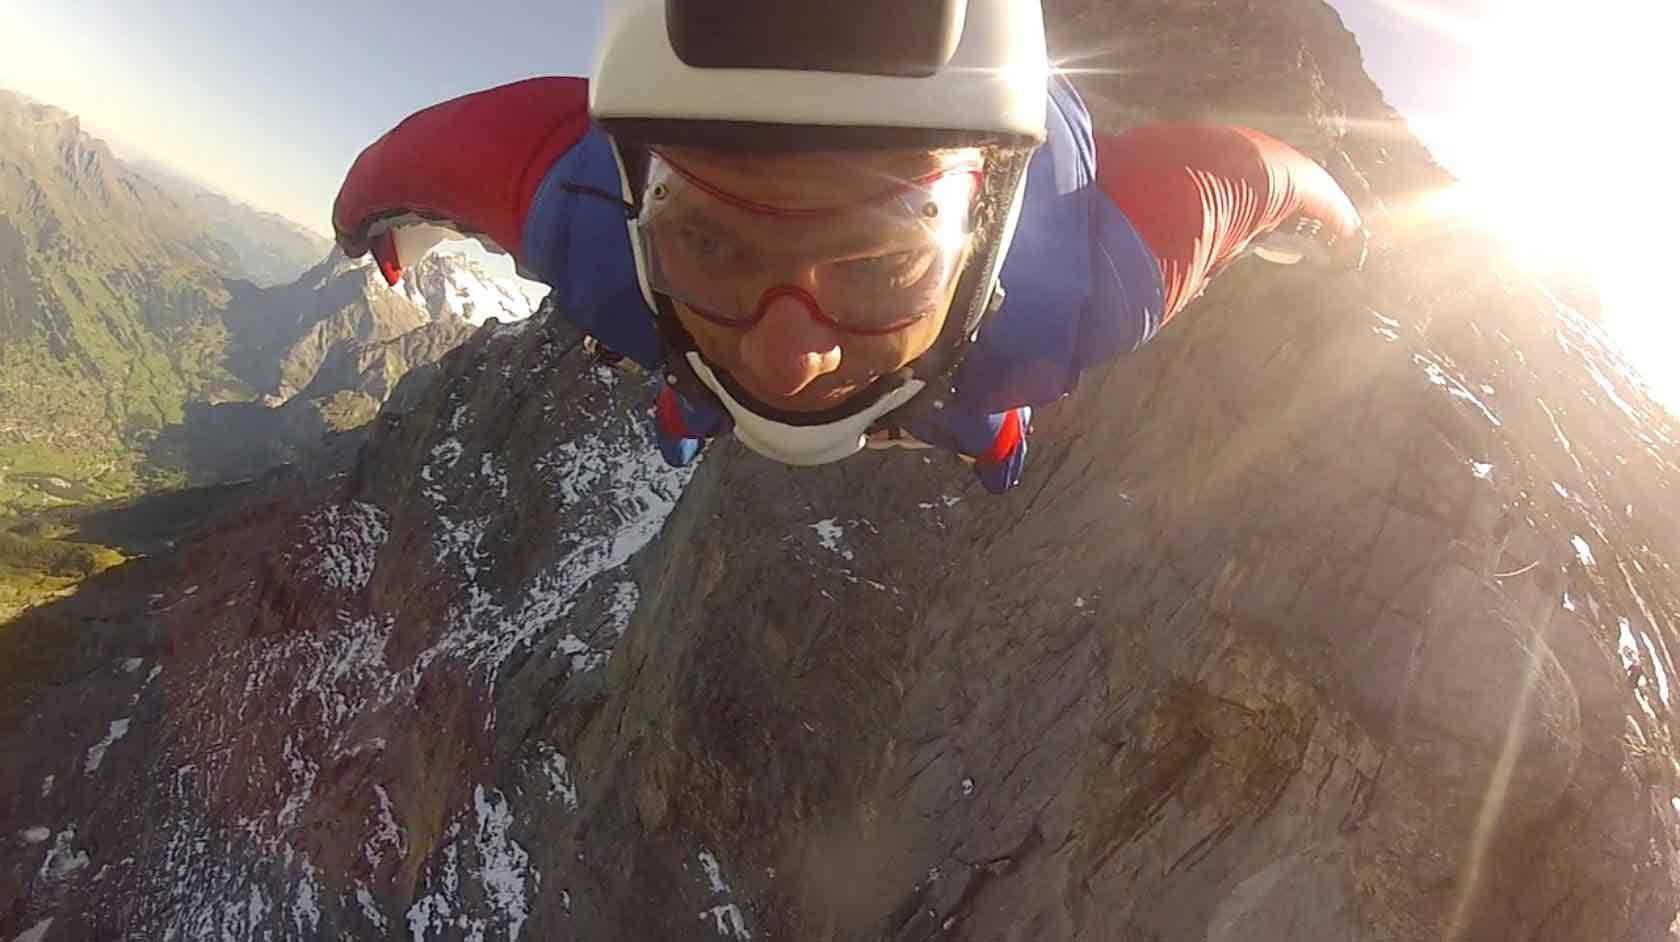 Alastair above the Eiger